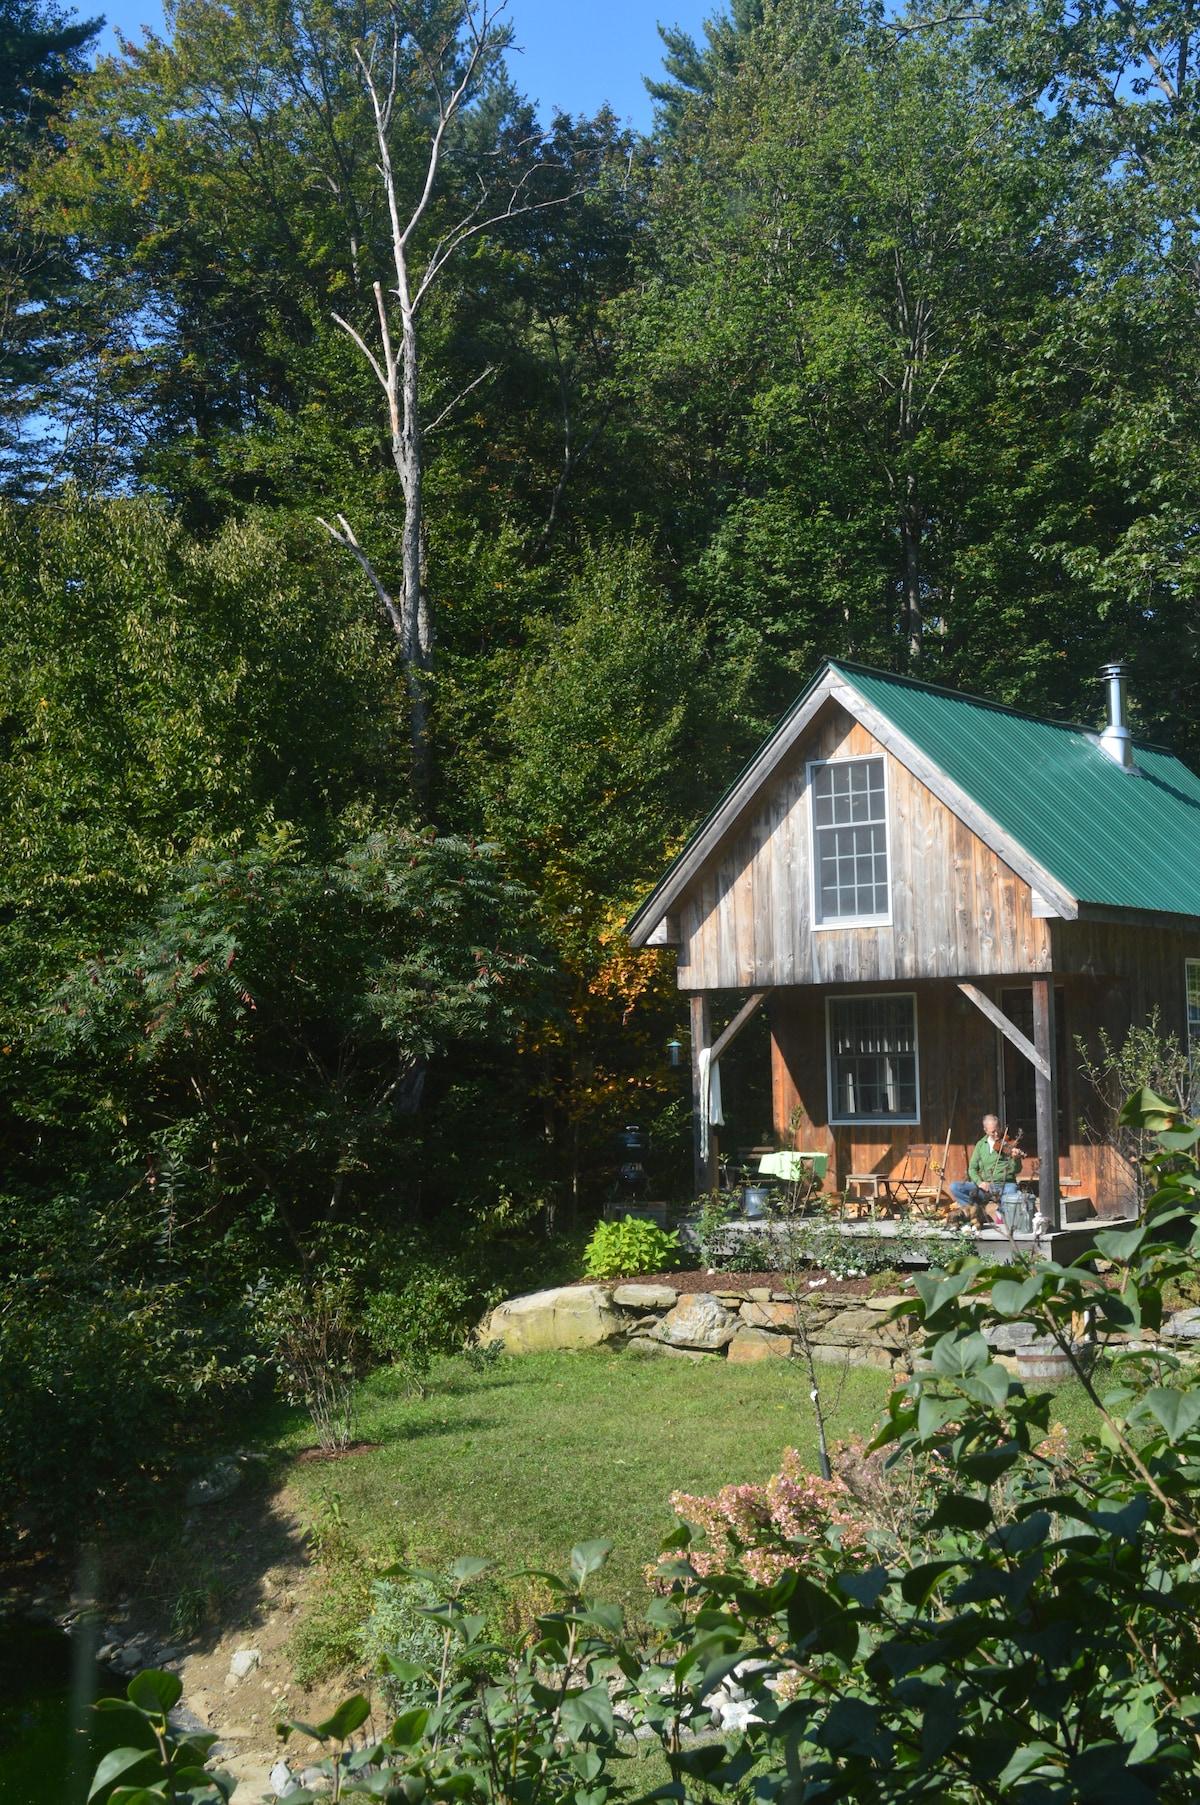 Solheim cabin in late summer